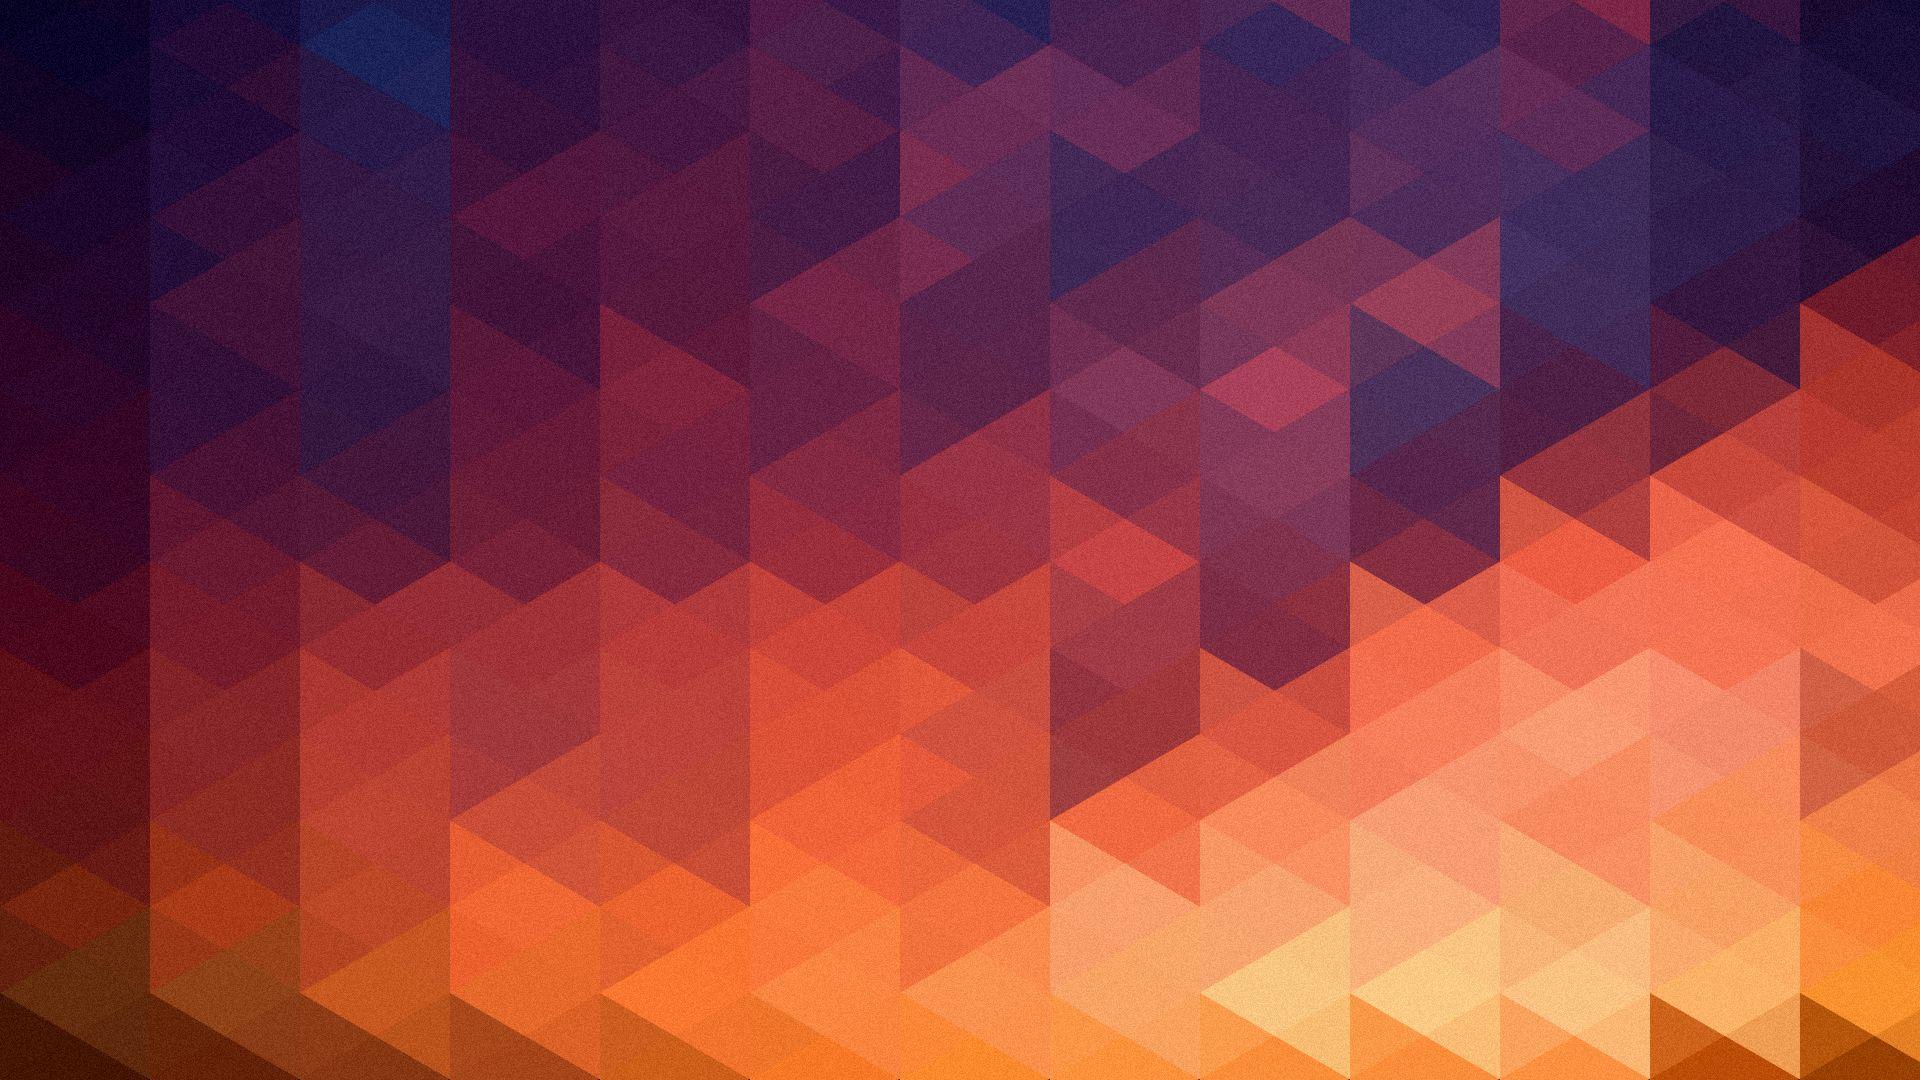 Geometric Multicolor Triangles HD Wallpaper FullHDWpp   Full HD 1920x1080